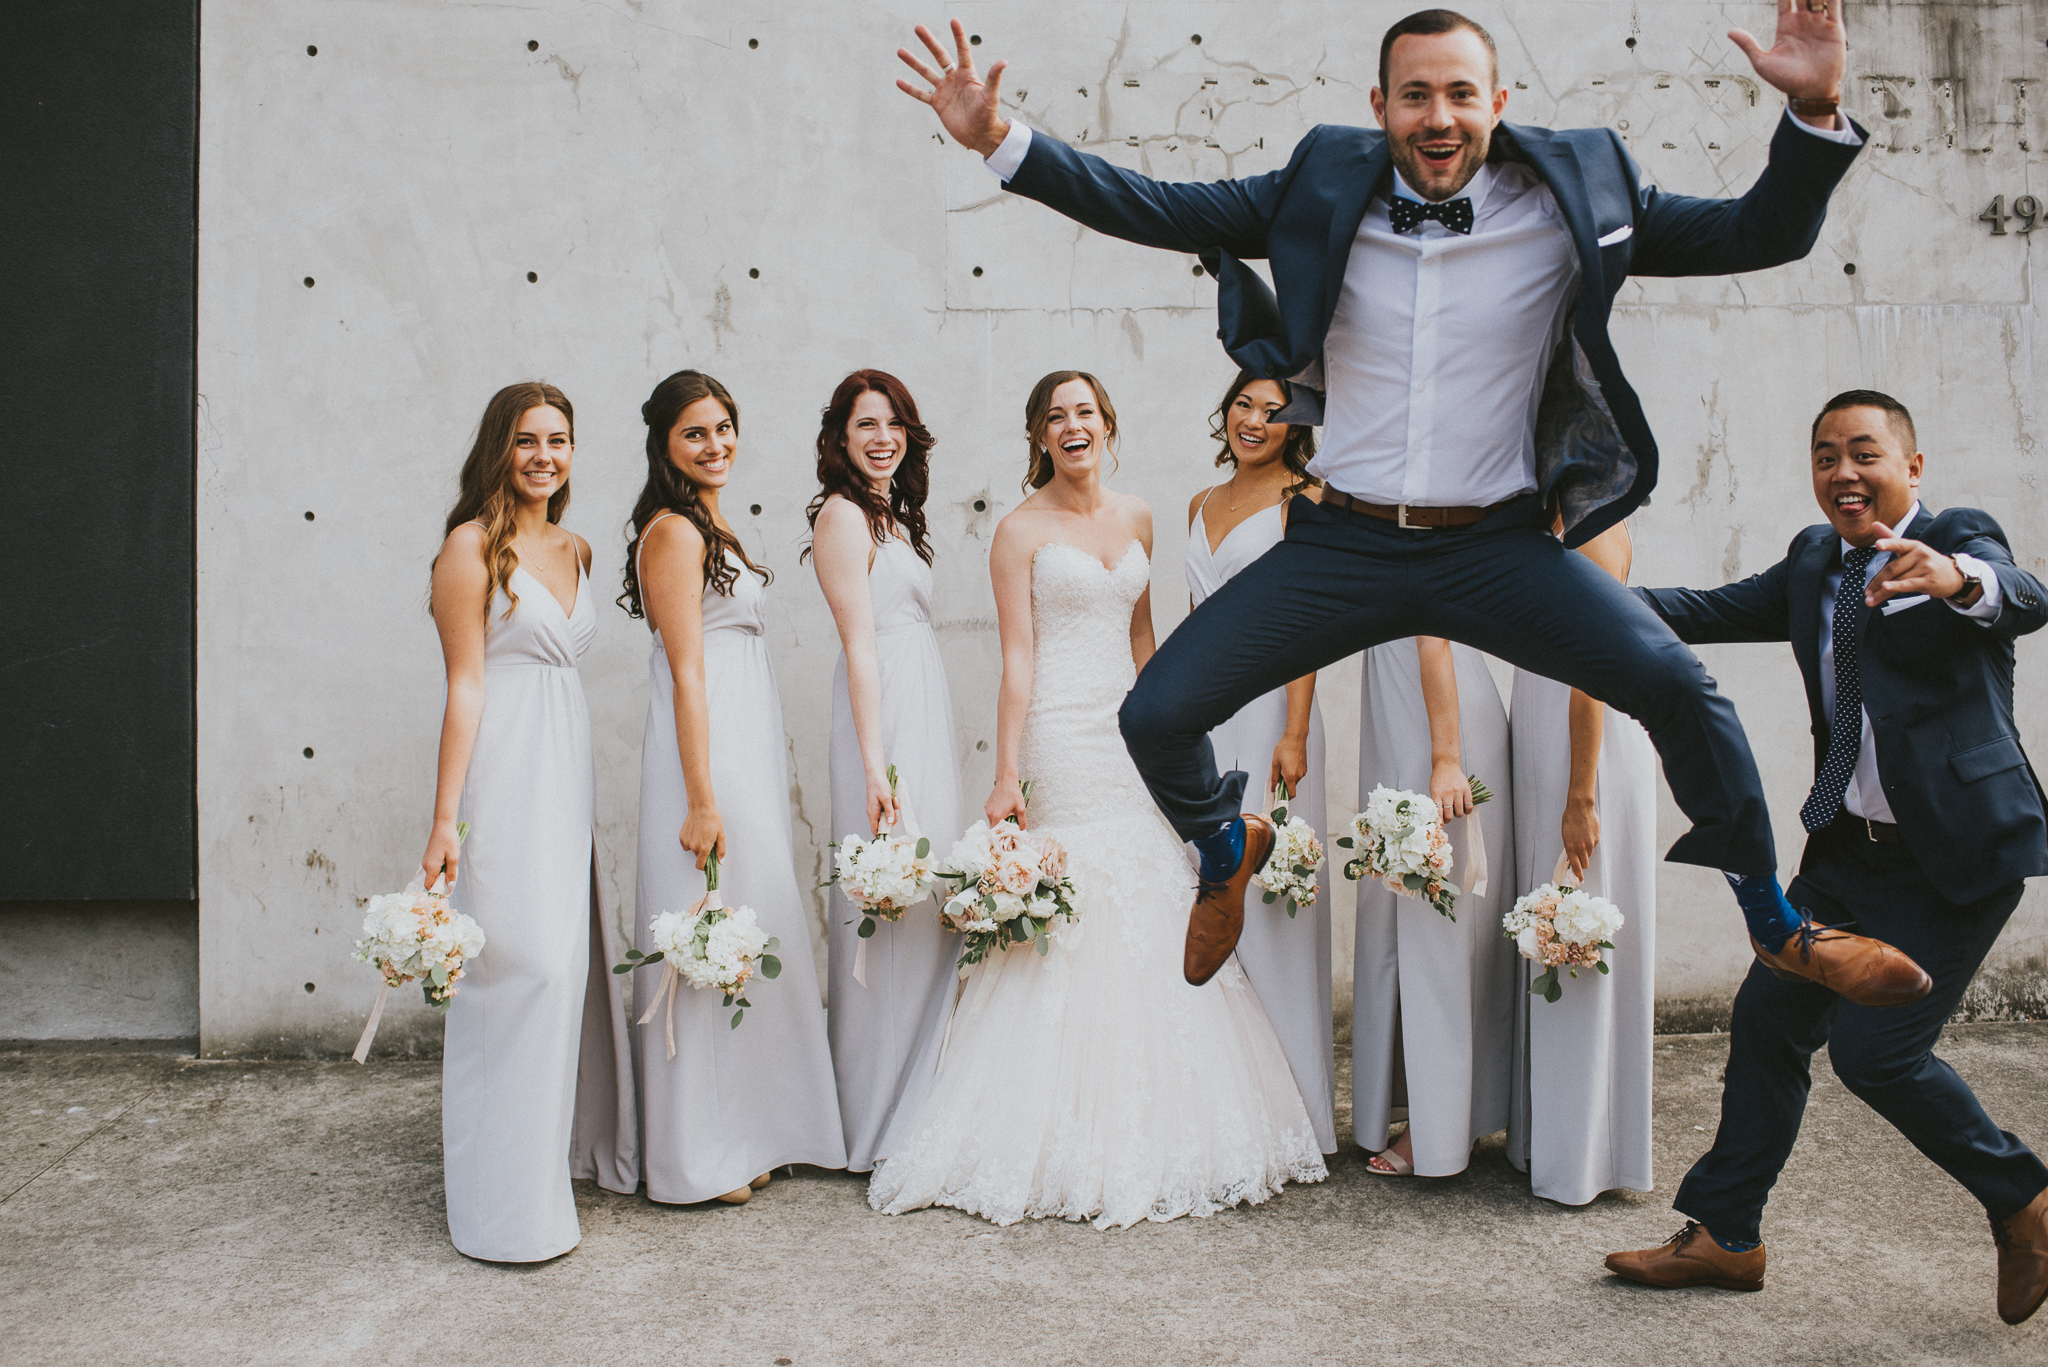 98-permanent-vancouver-wedding-courtneysteven-web-8409.jpg